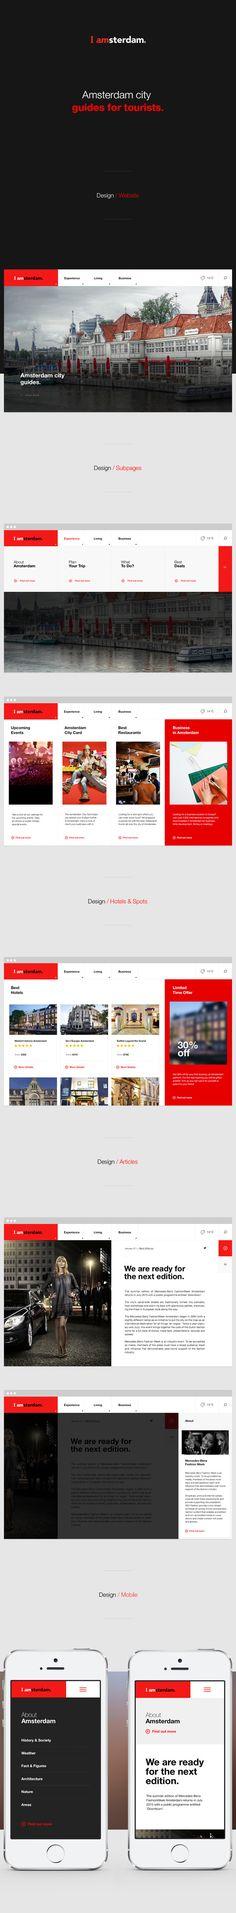 http://www.webdesignserved.com/gallery/Iamsterdam/23447667